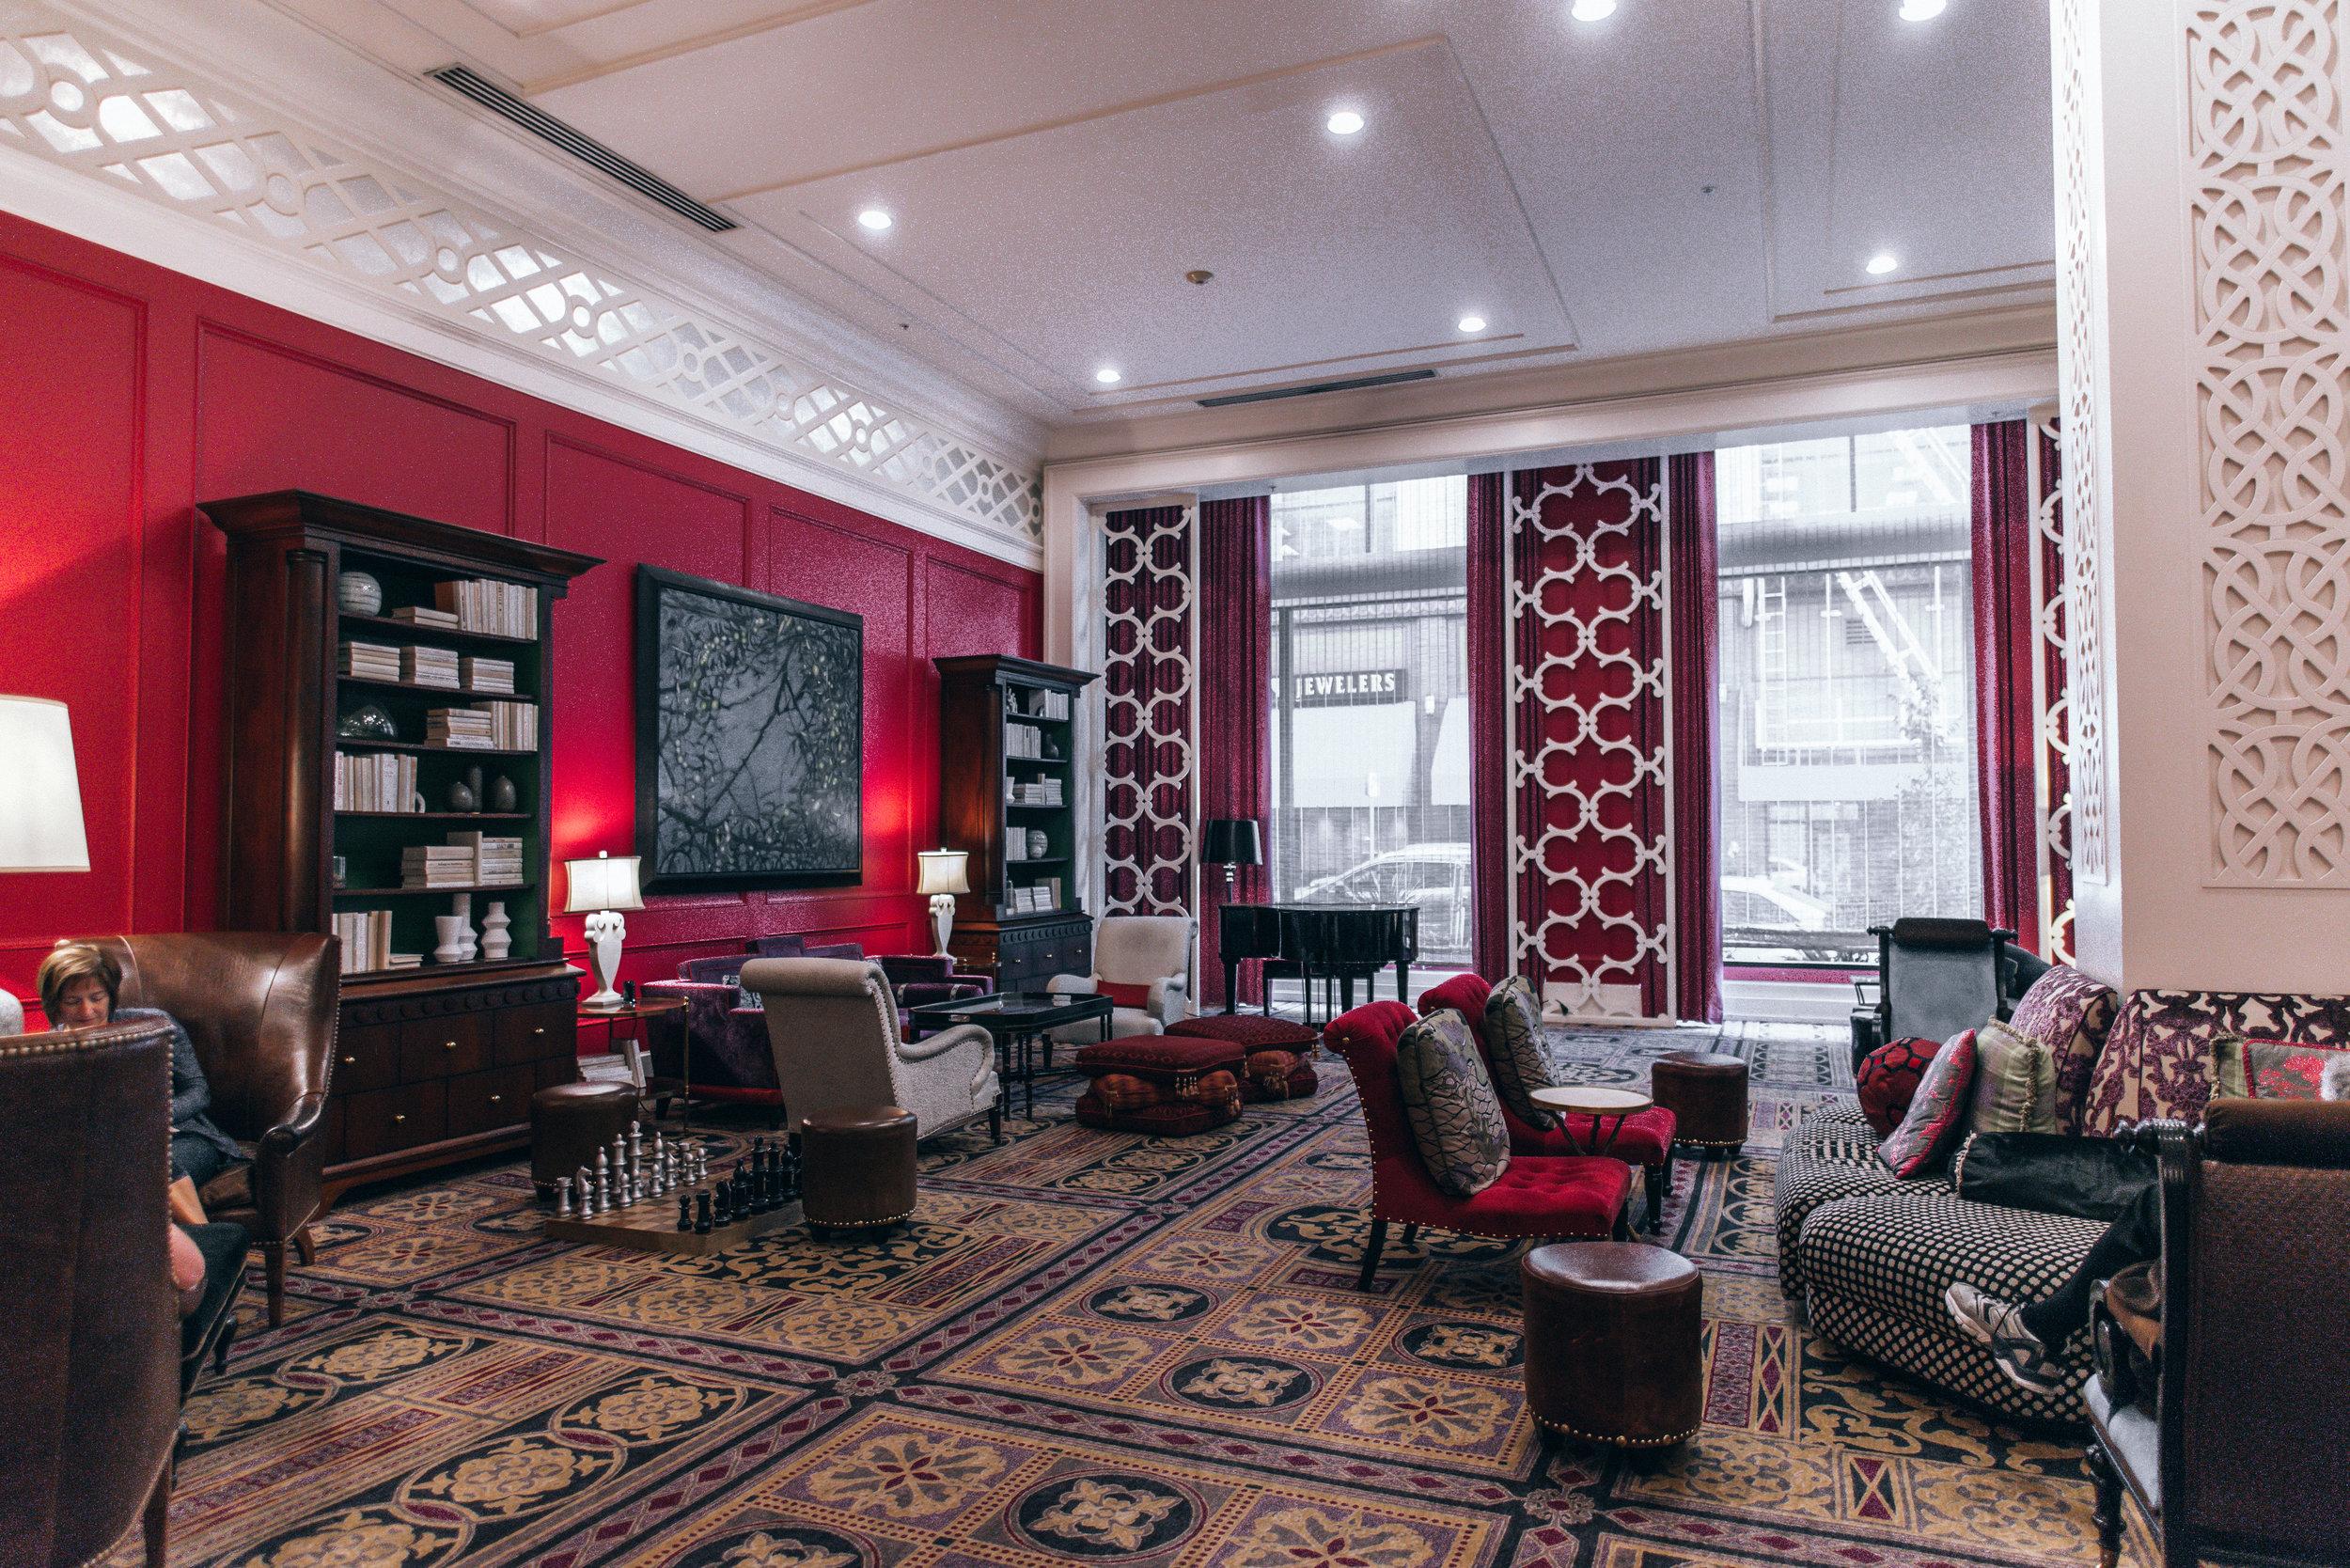 hotel-monaco-pdx-by-lisa-linh